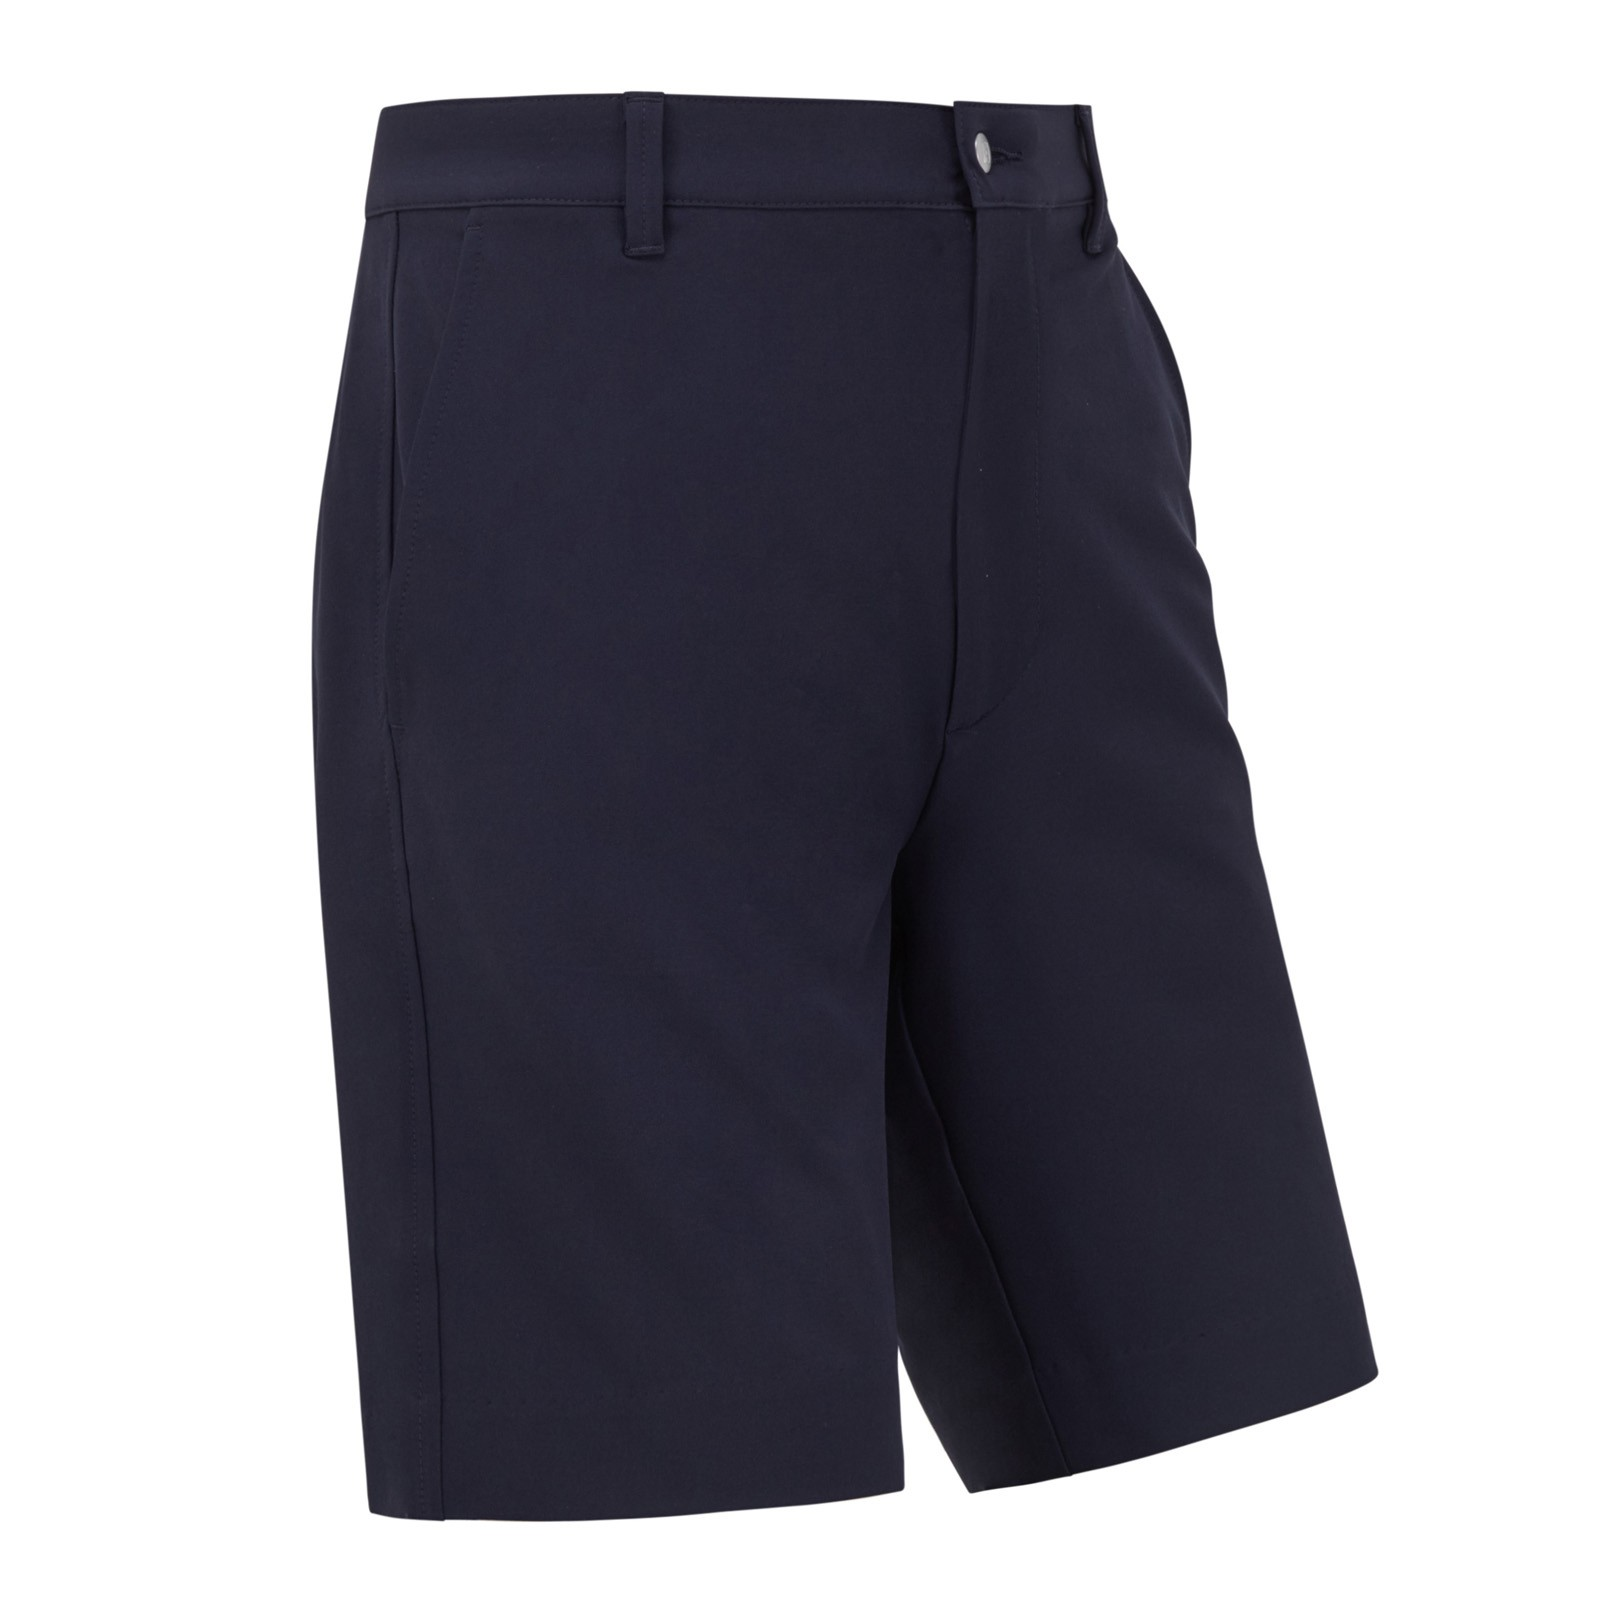 Footjoy Performance Regular Fit Shorts